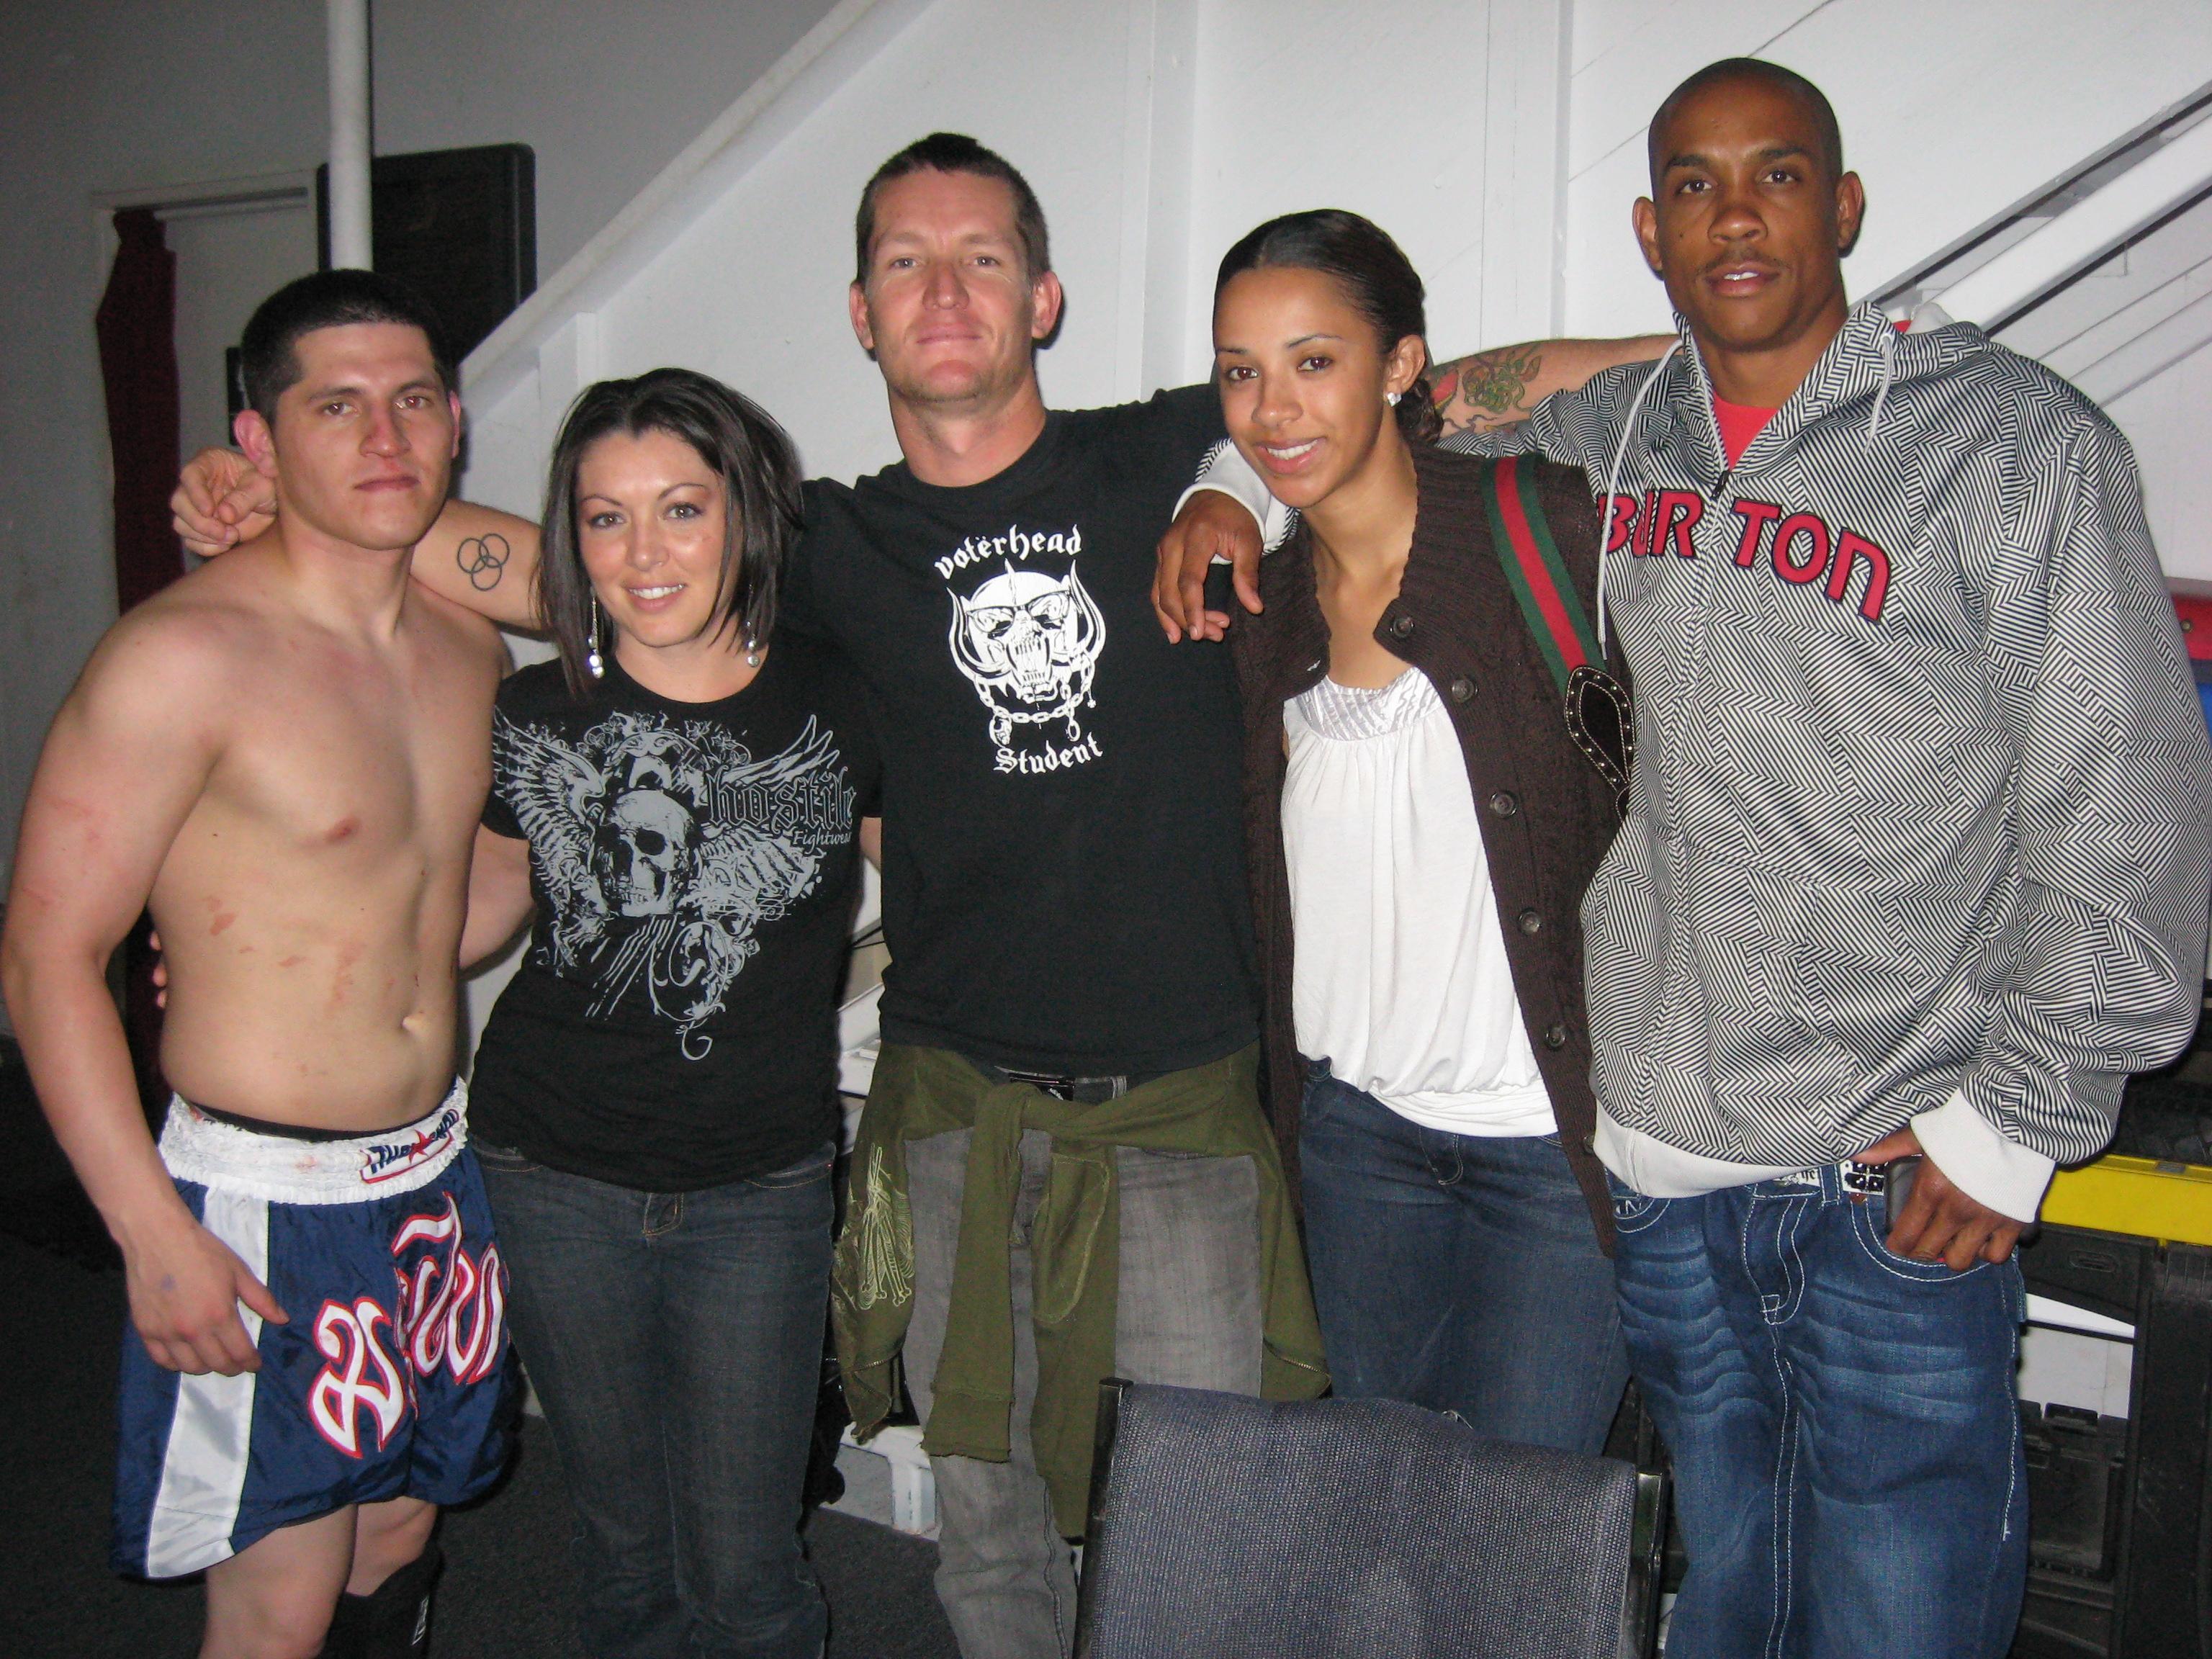 Legends' fight team represented for James Acosta's (left) debut.